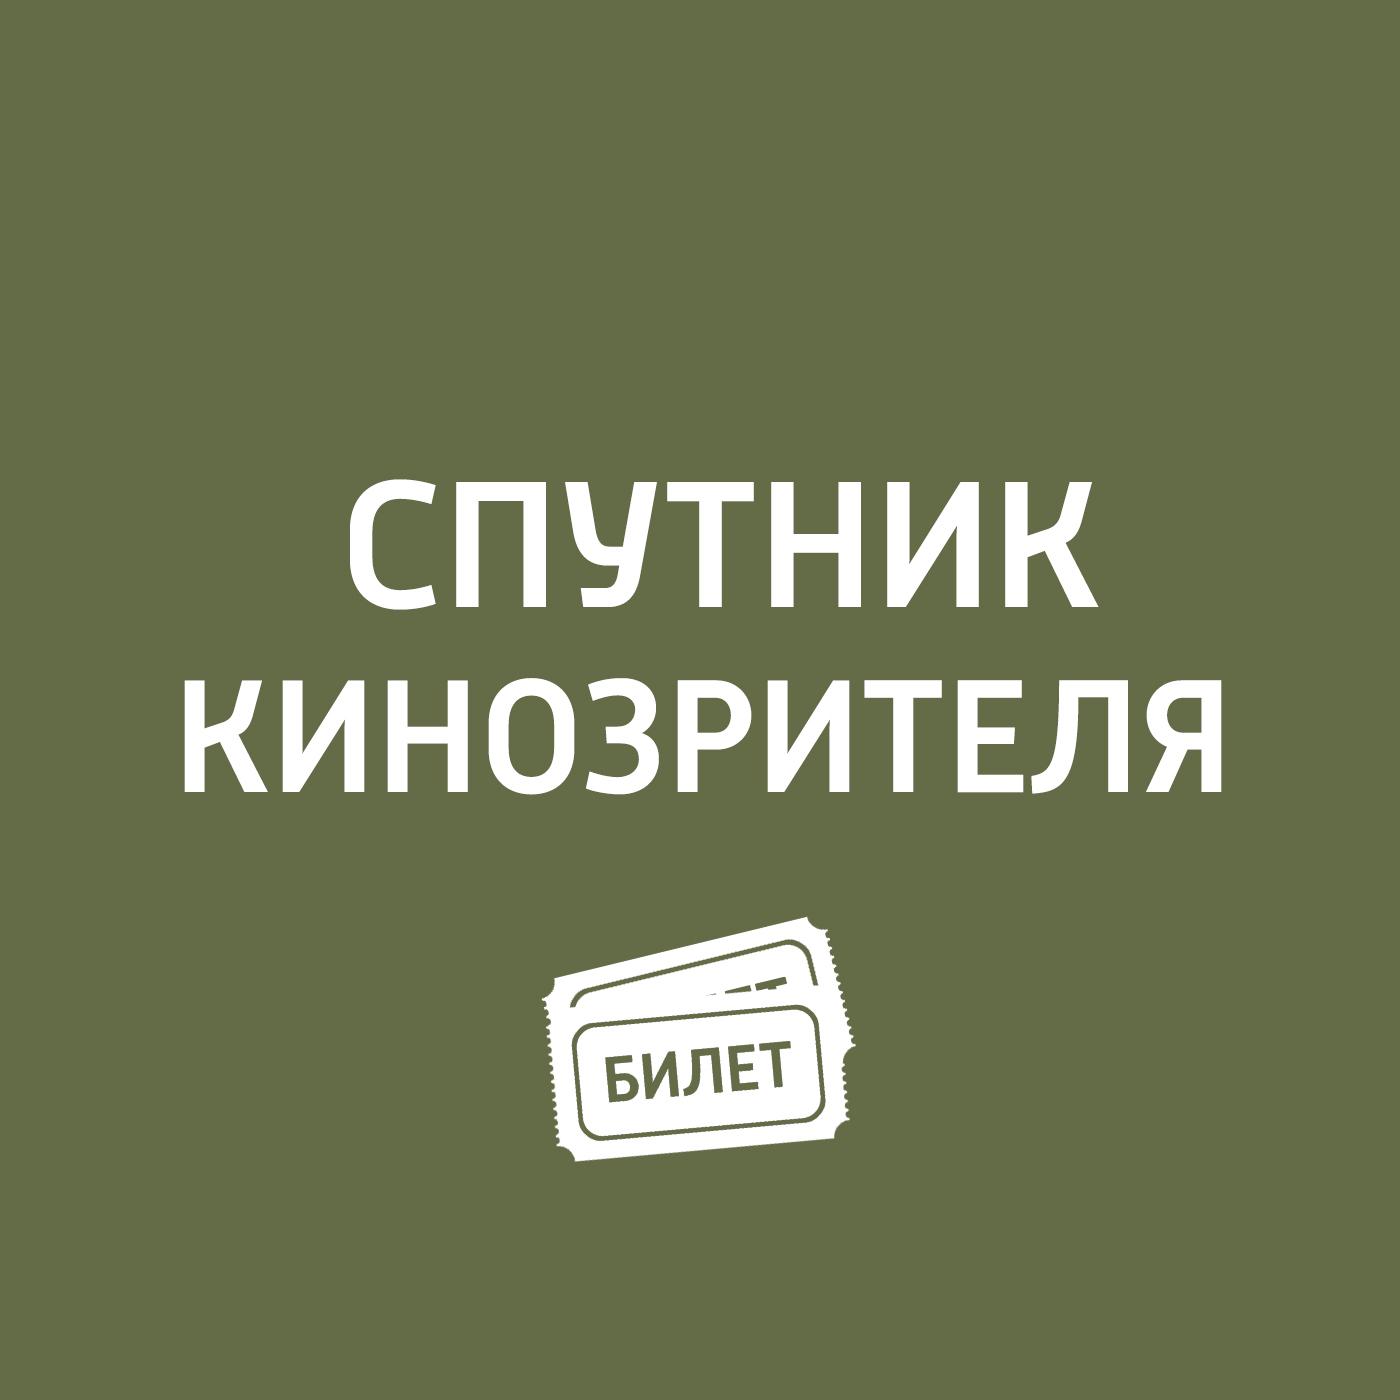 Антон Долин Алексей Юрьевич Герман антон долин трудно быть богом нимфоманка 2 дубровский